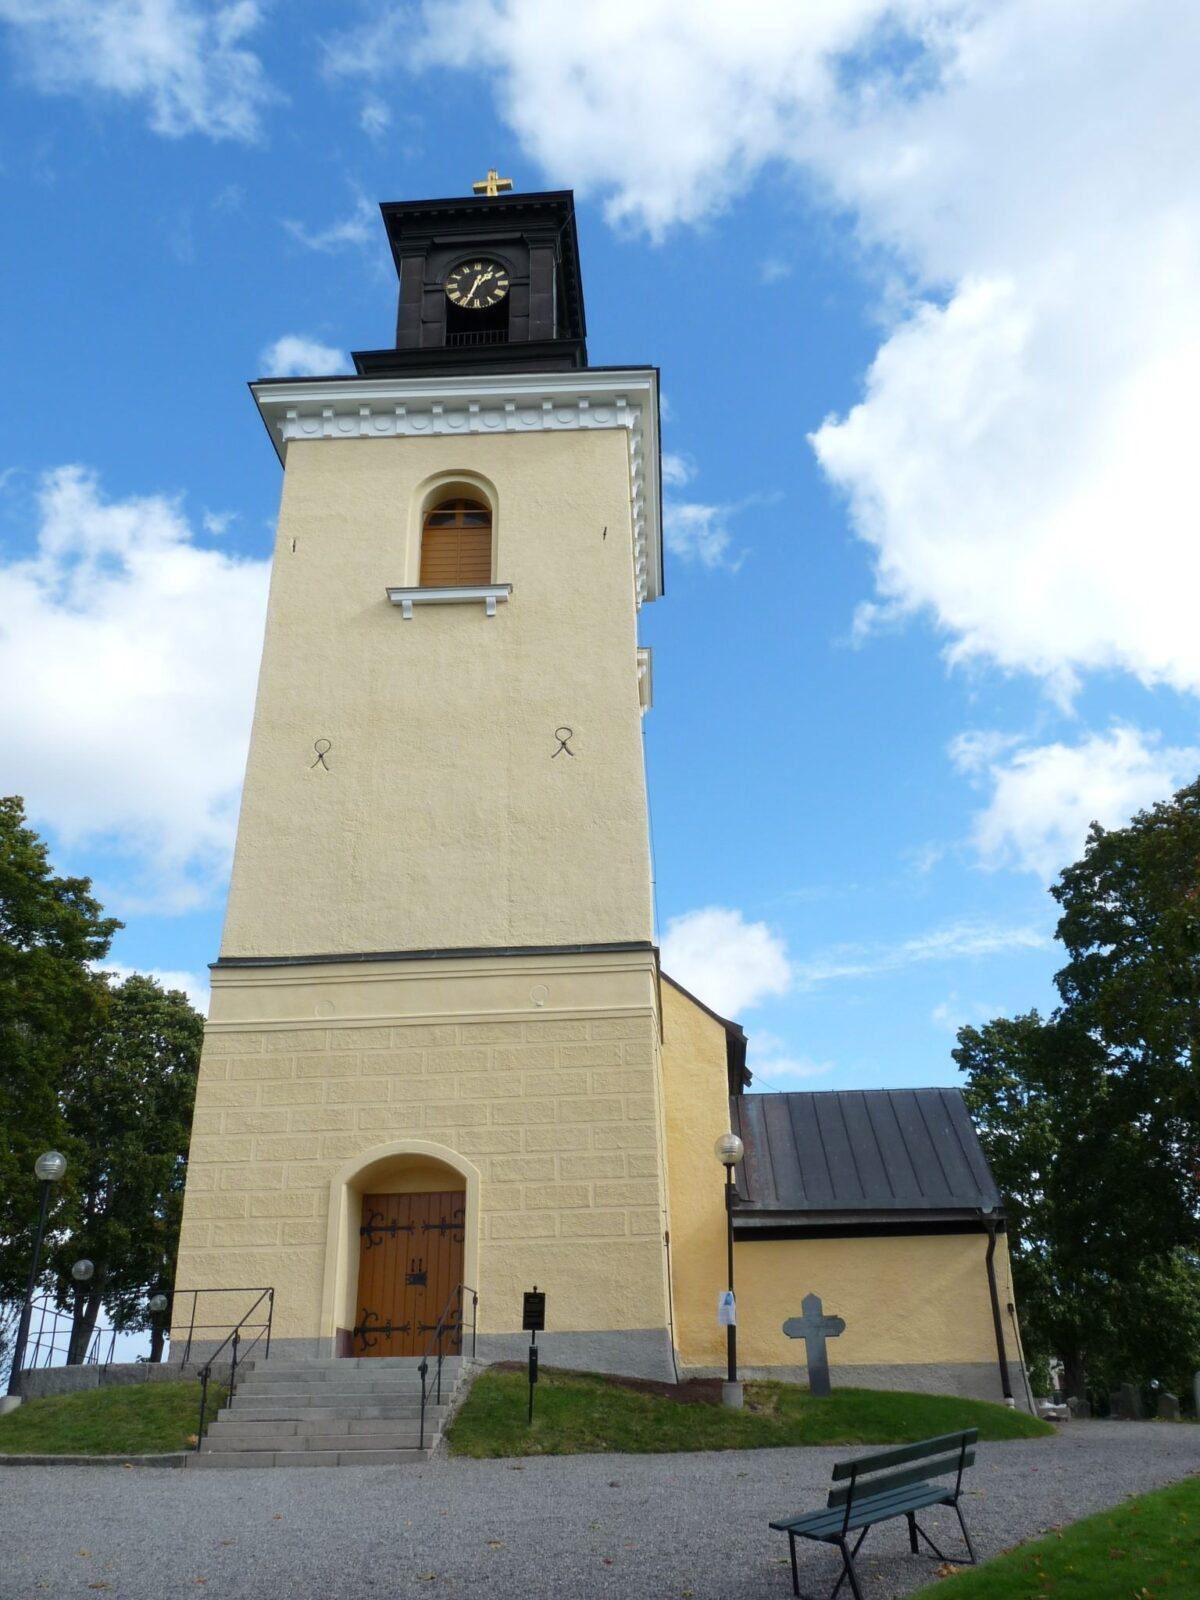 Turinge kyrka-P1030242-e1349803659737